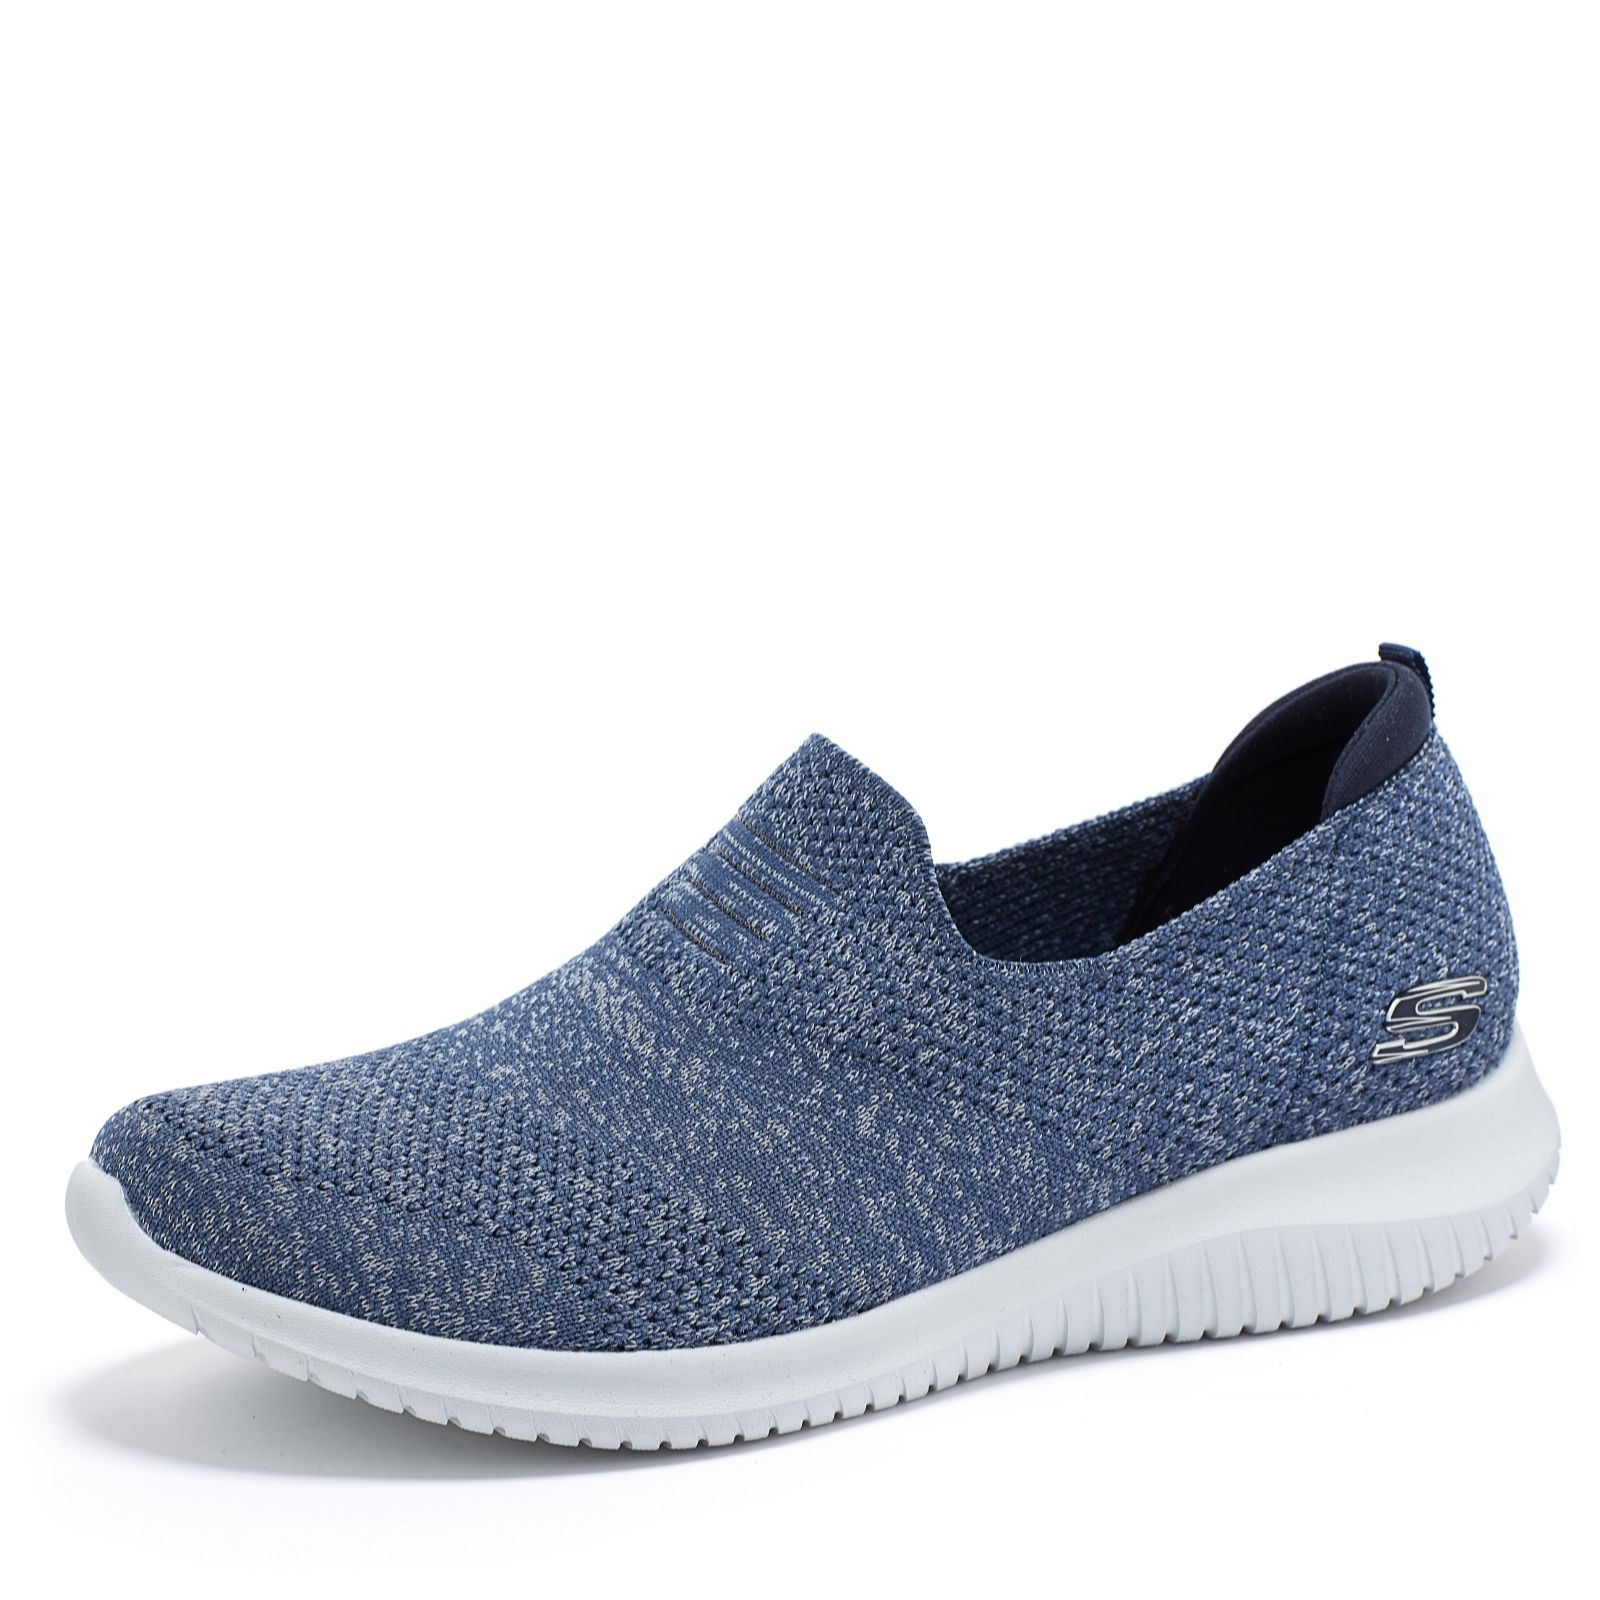 5705be8d47040 Skechers Ultra Flex Harmonious Knitted Slip On Shoe - QVC UK